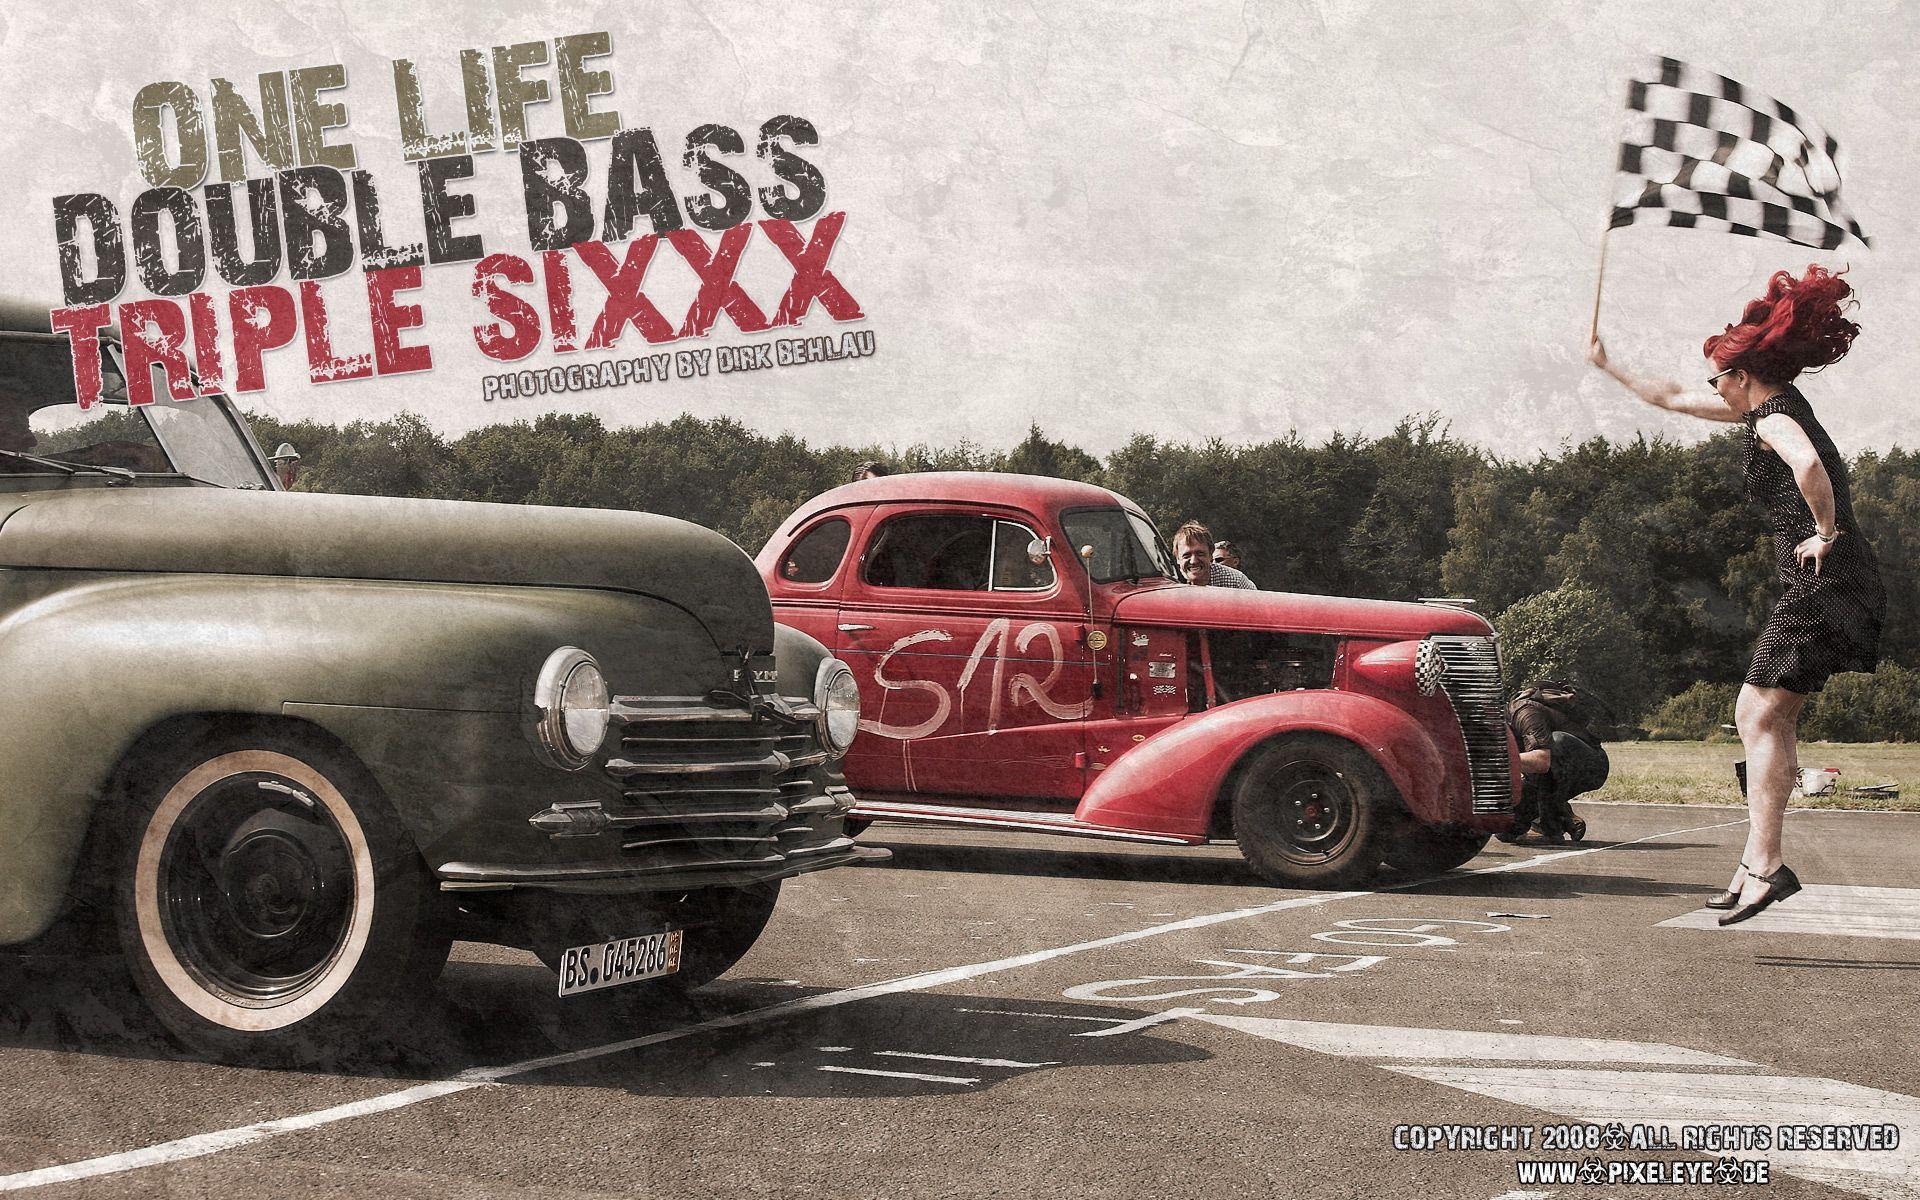 Hot Cars Wallpaper | Hot Rod Widescreen Pixel 10 1920X1200 Deluxe Car Wallpaper